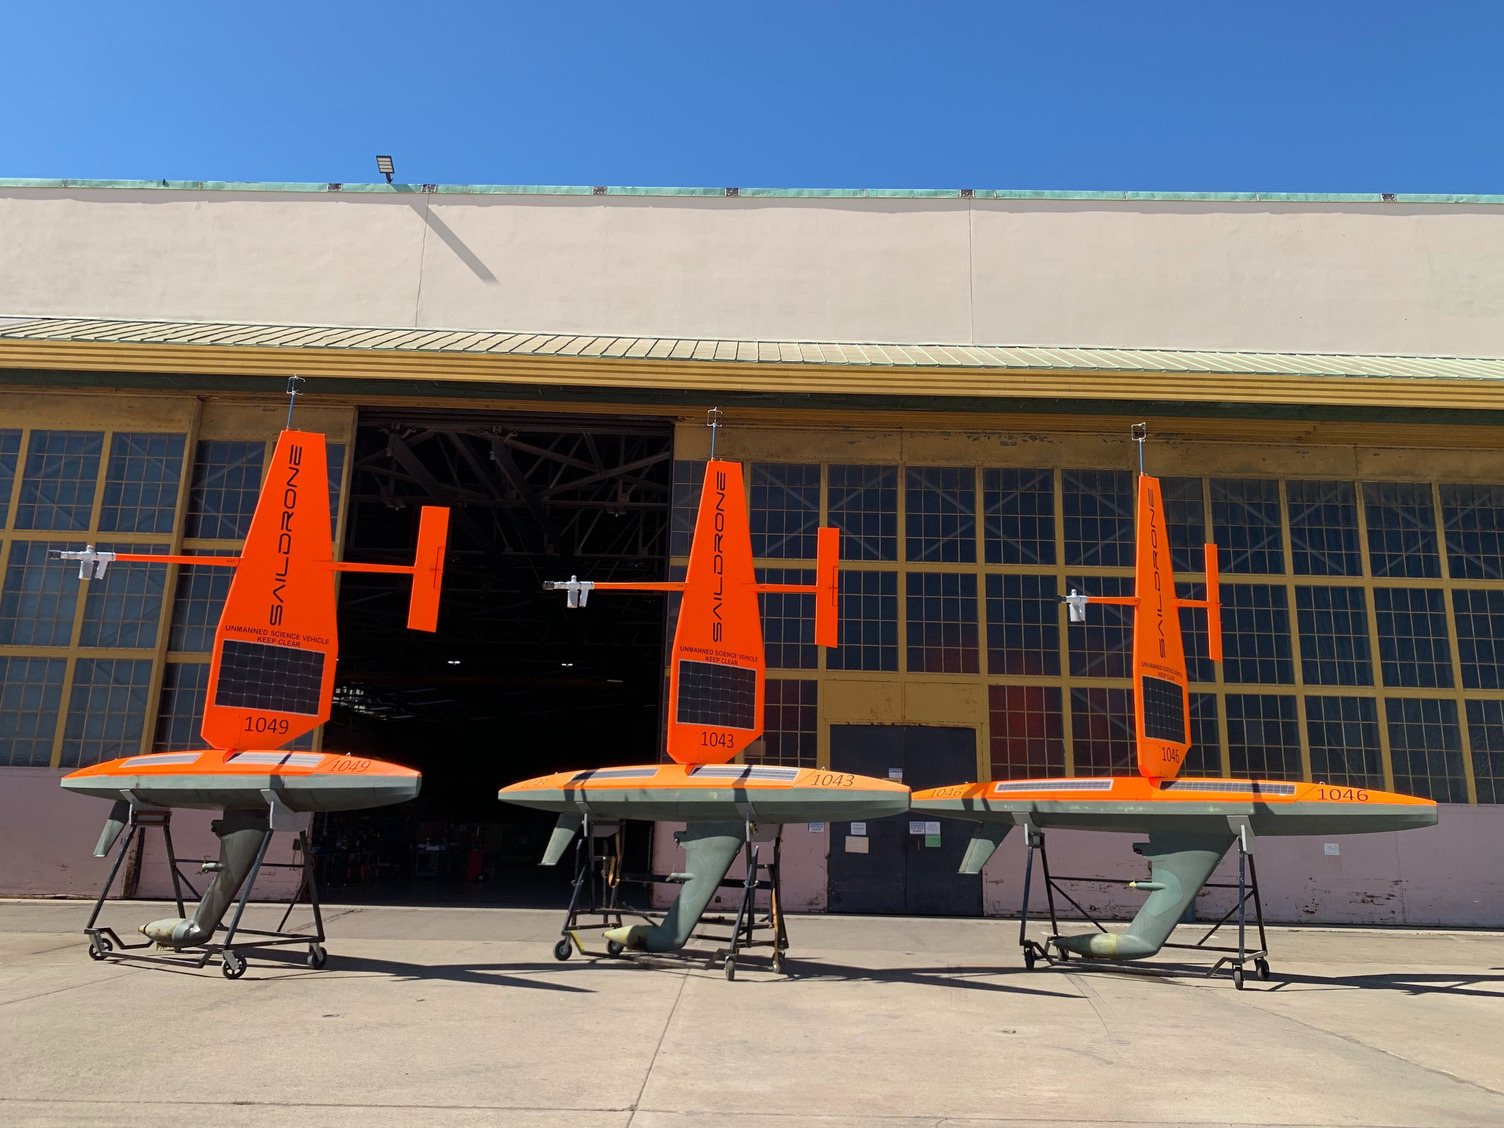 Photo of Saildrones on cradles next to a warehouse hanger.